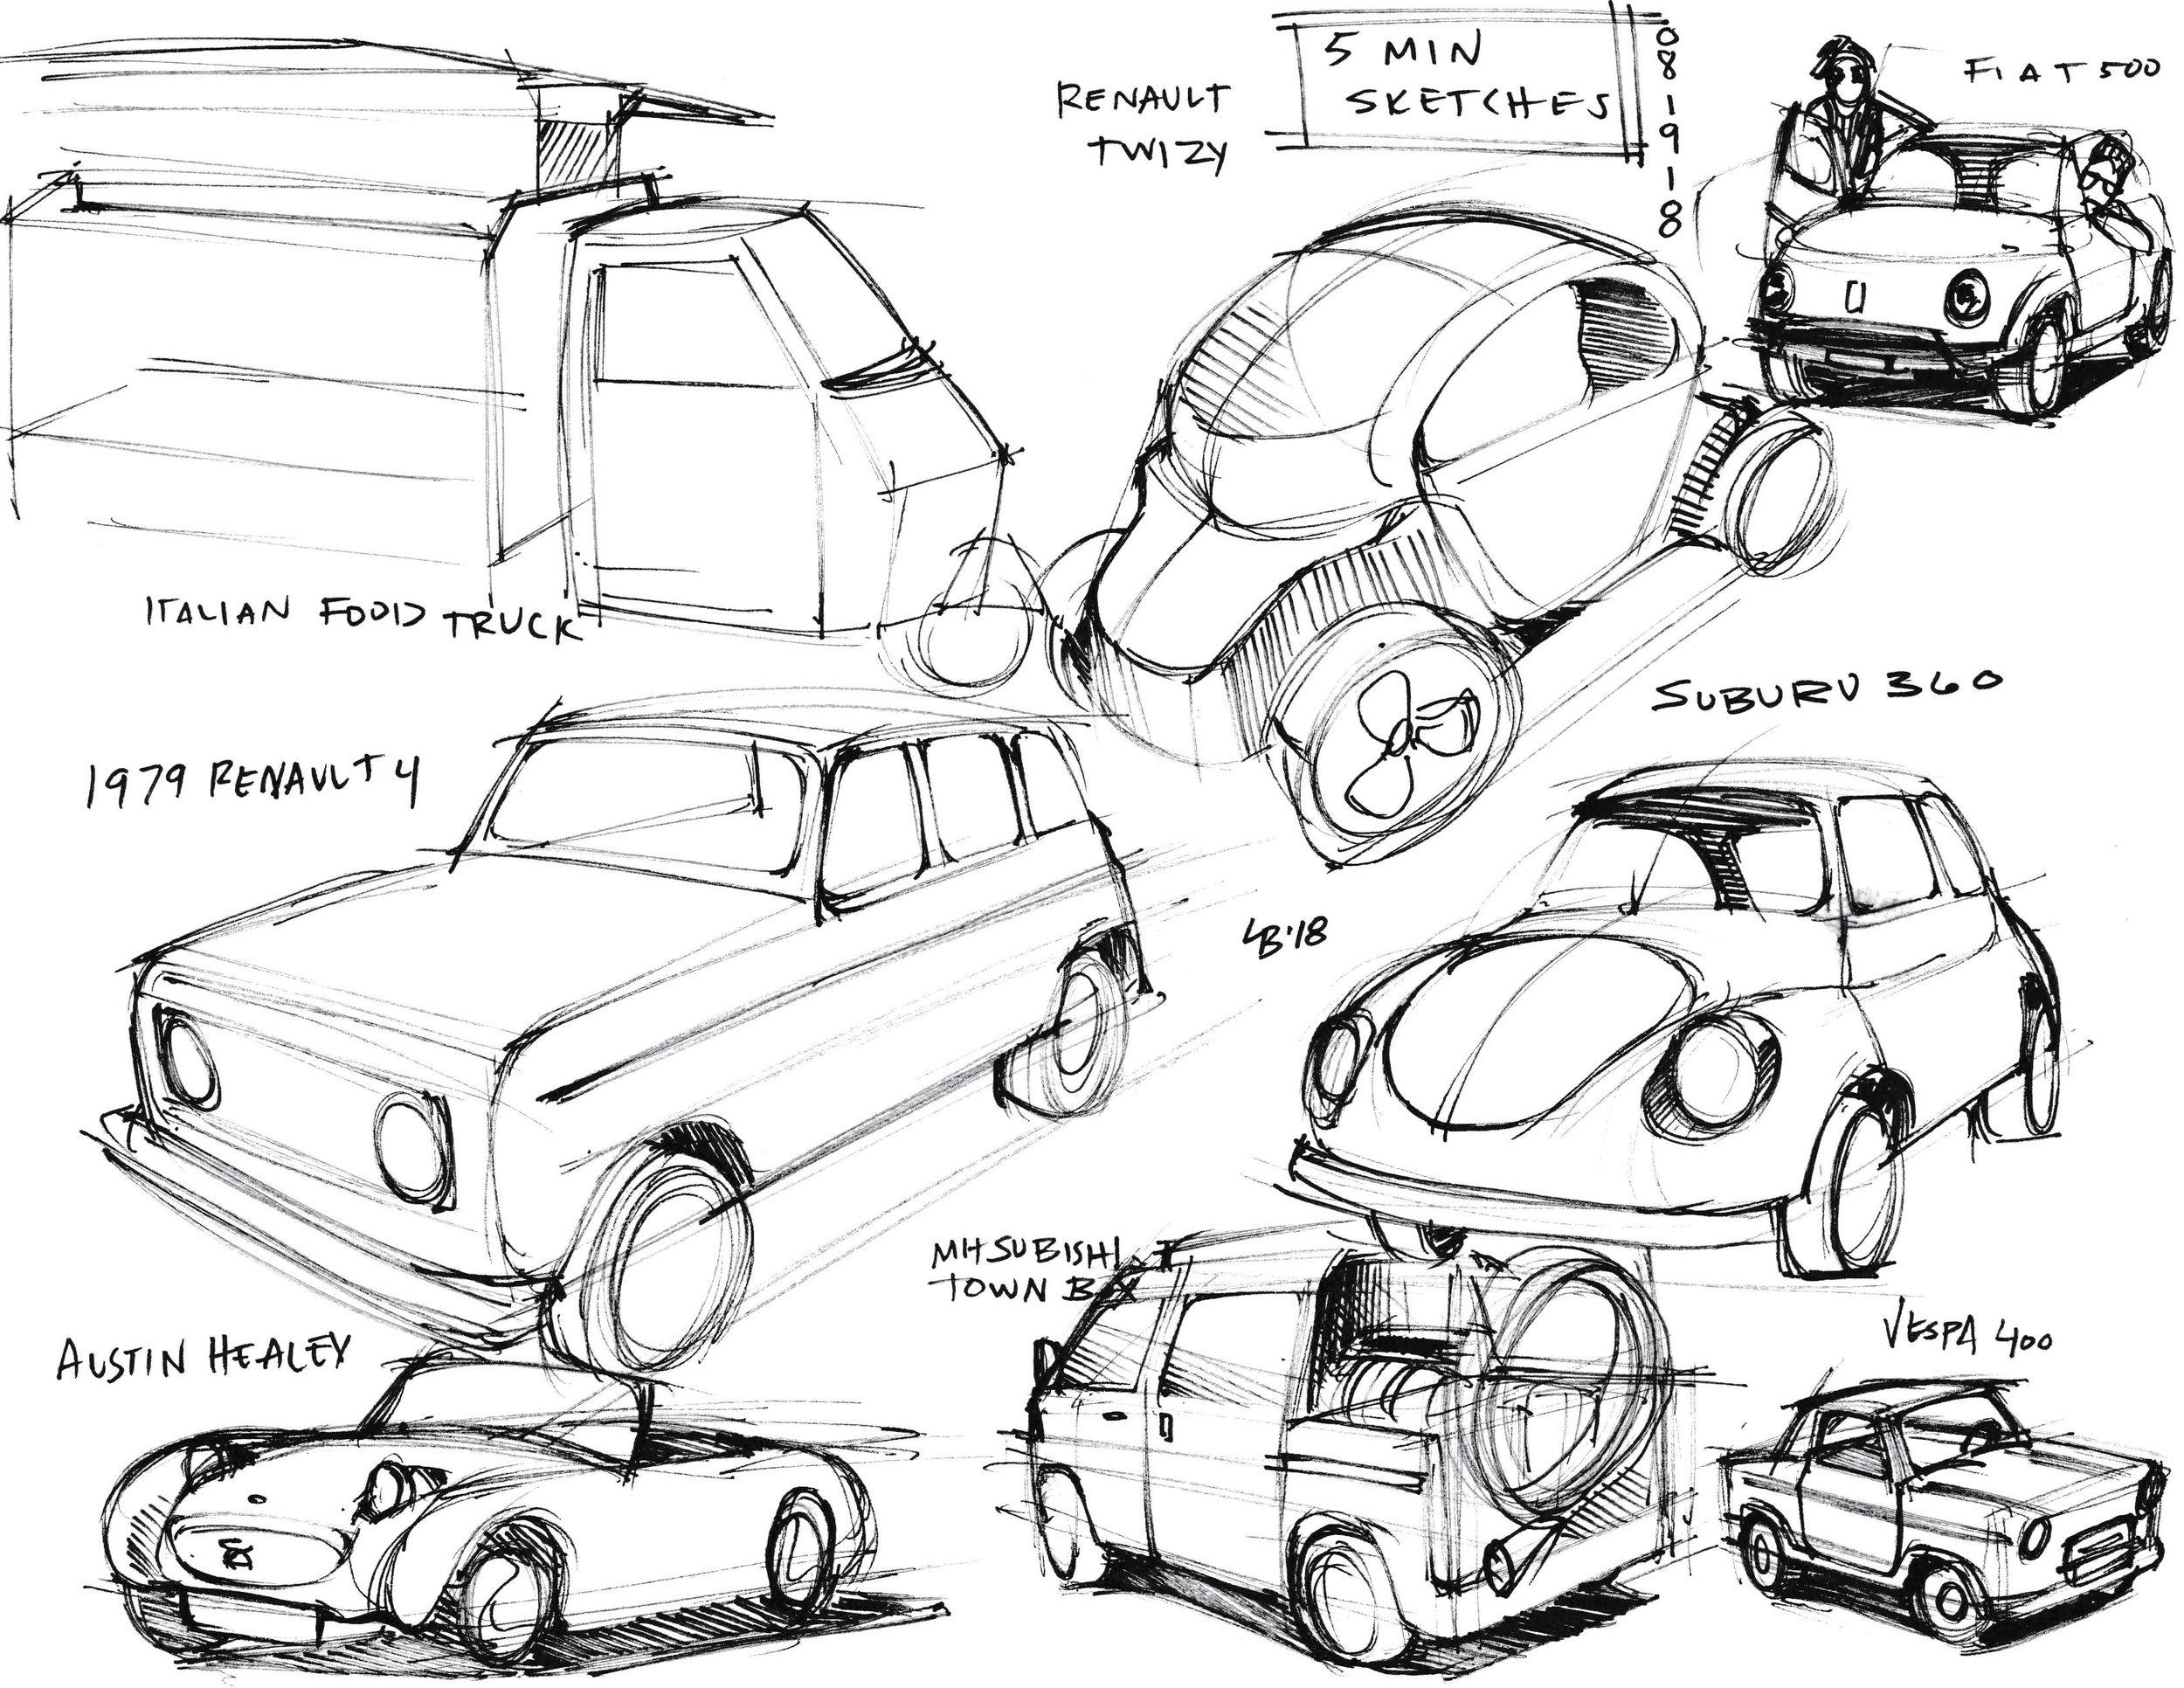 lindabui-5min-carsketches1.jpg